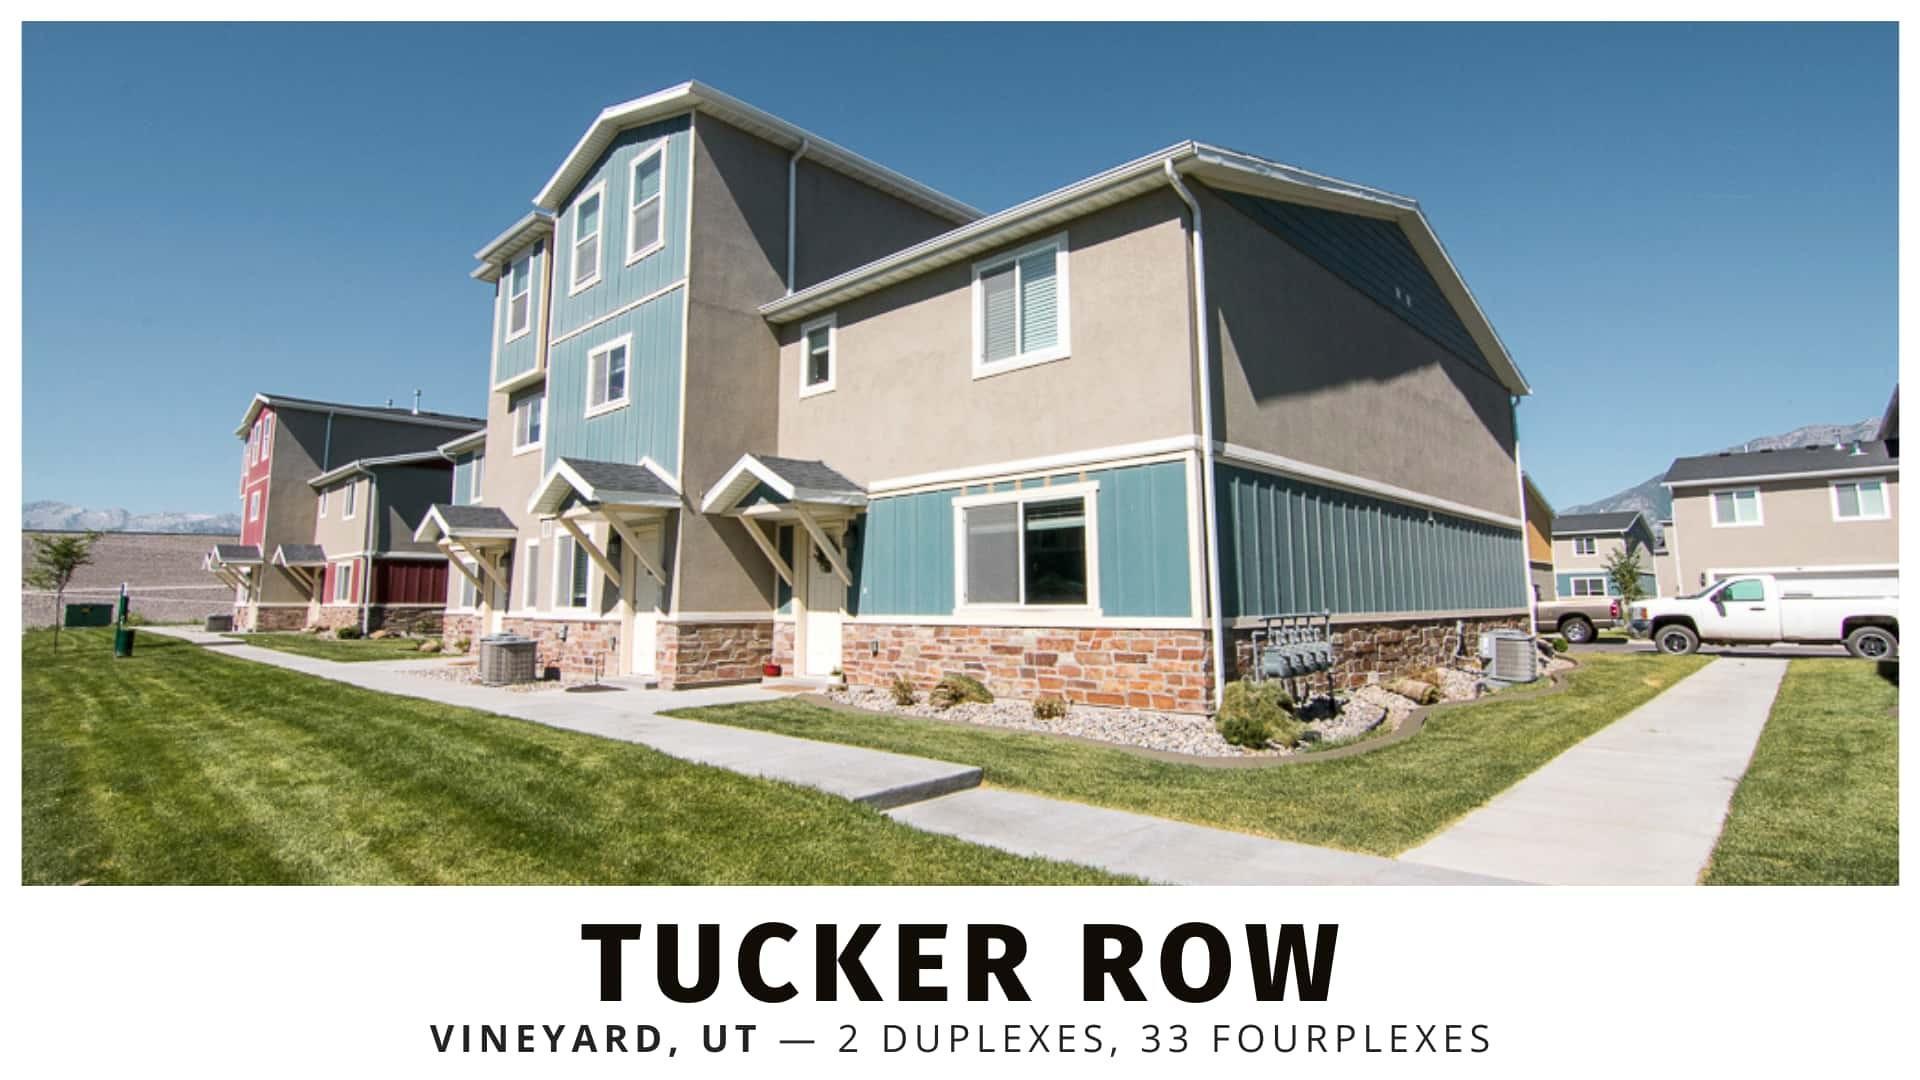 Tucker Row duplexes and fourplexes in Utah County